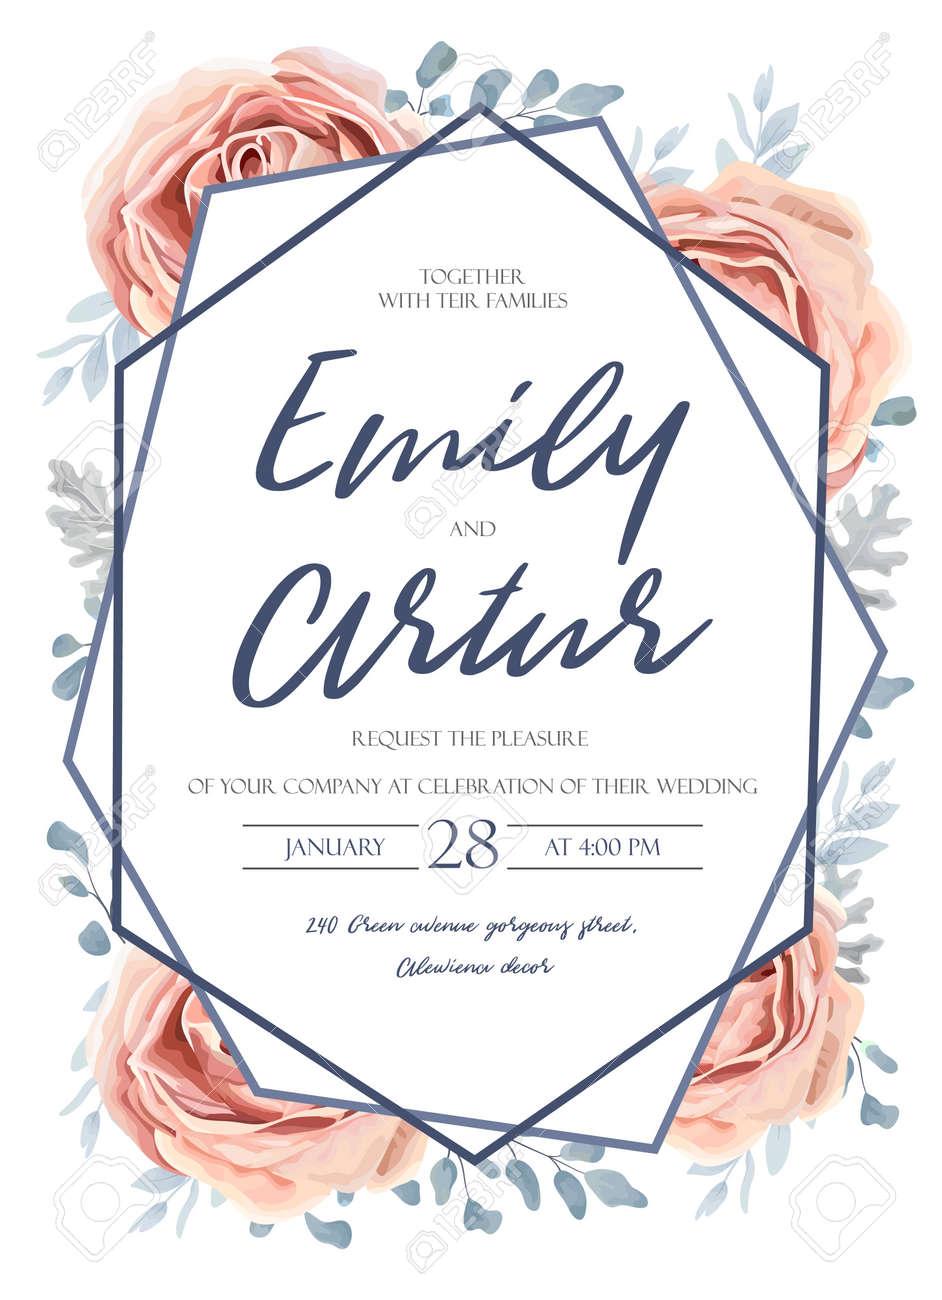 Wedding Invitation Invitation Save The Date Card Design Pink